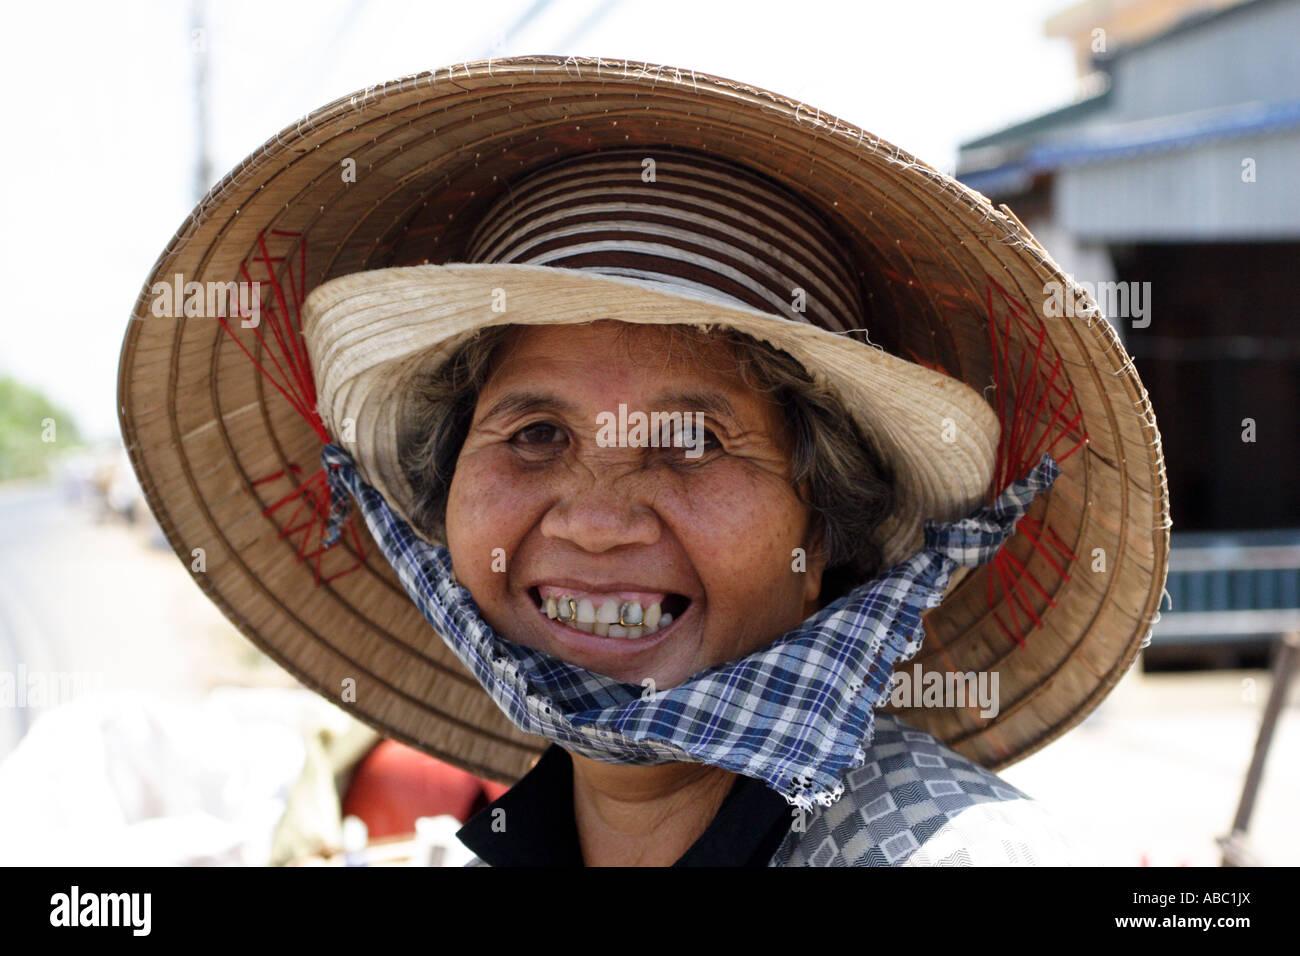 Conical Teeth Imágenes De Stock   Conical Teeth Fotos De Stock - Alamy d647f9d3063